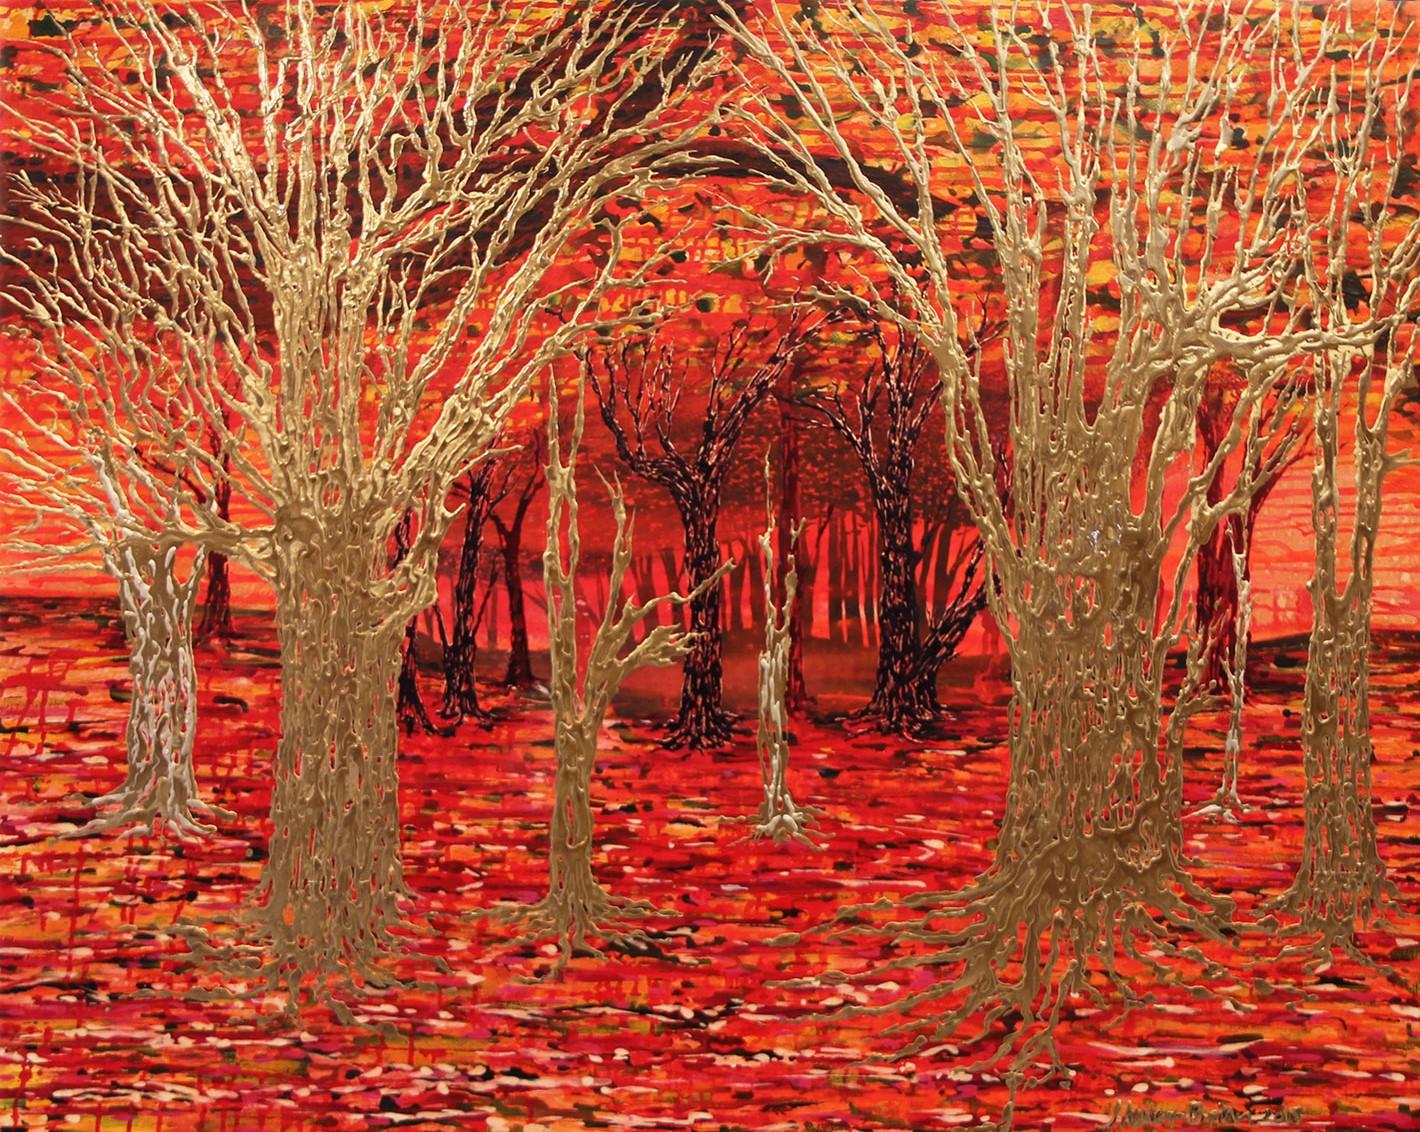 Autumn Glade b